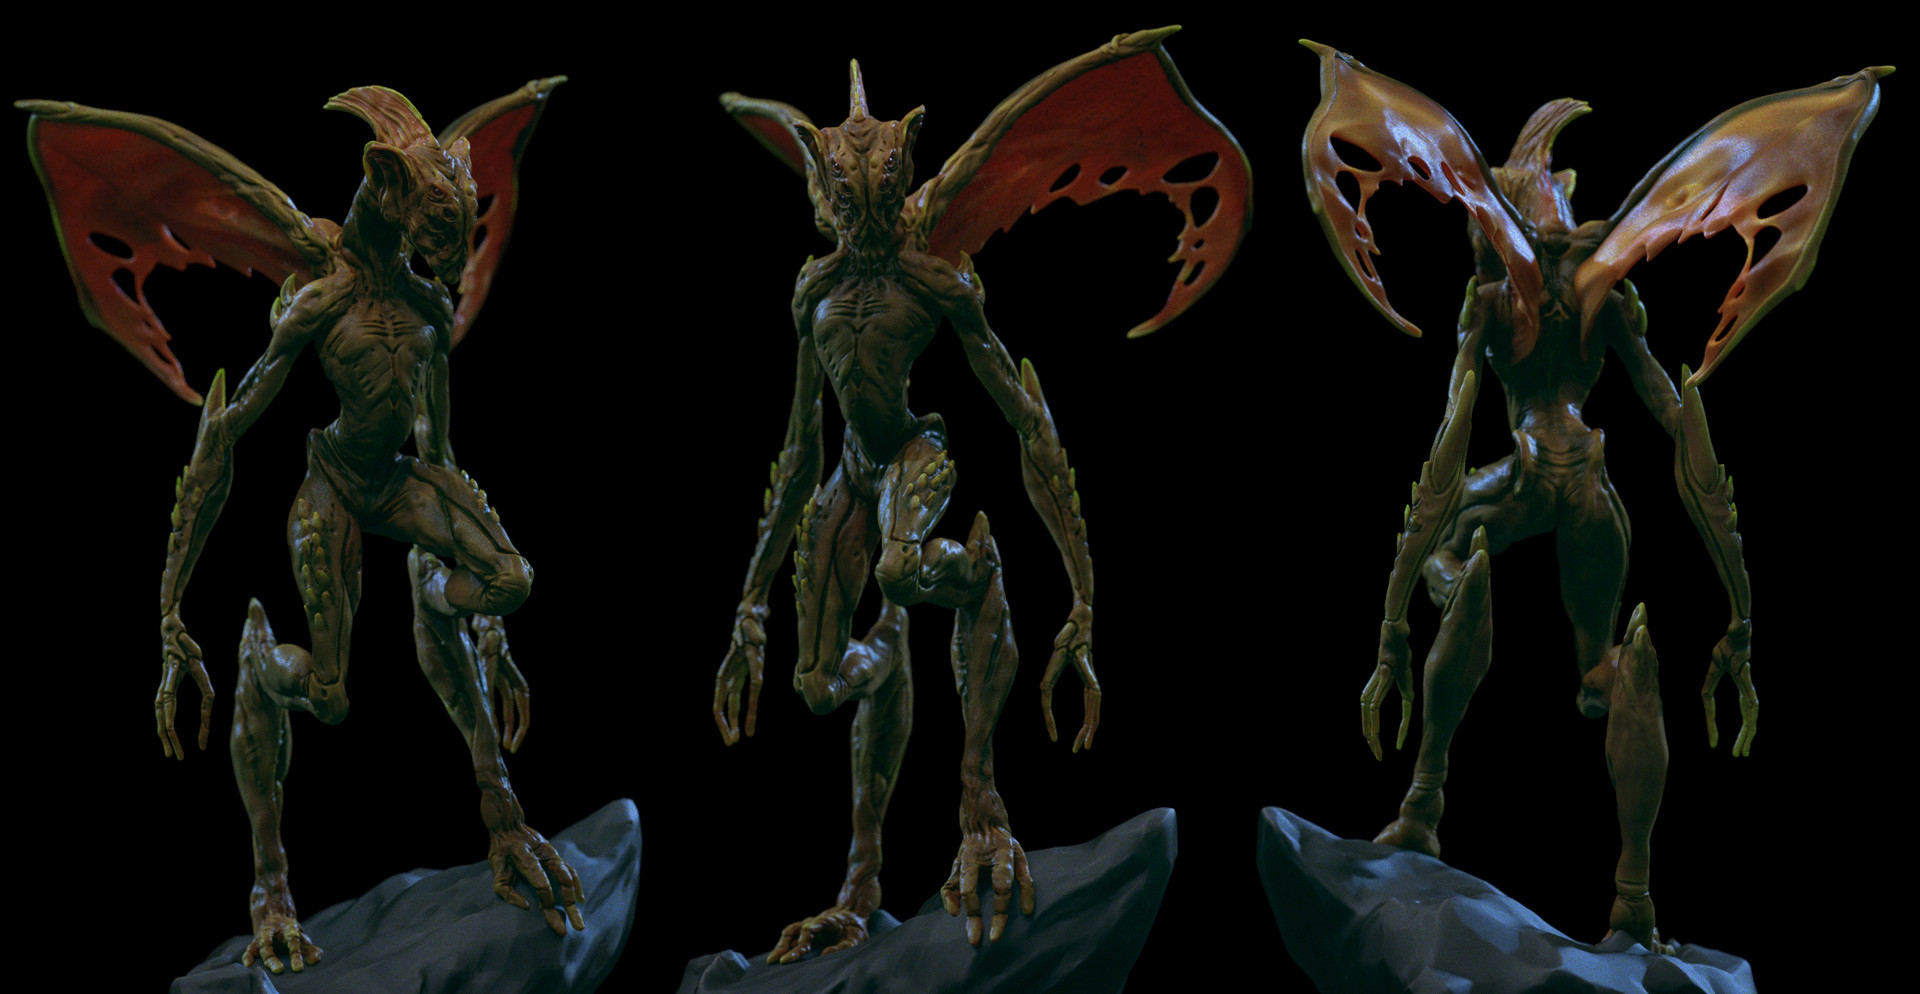 Ilhan yilmaz creature render 13